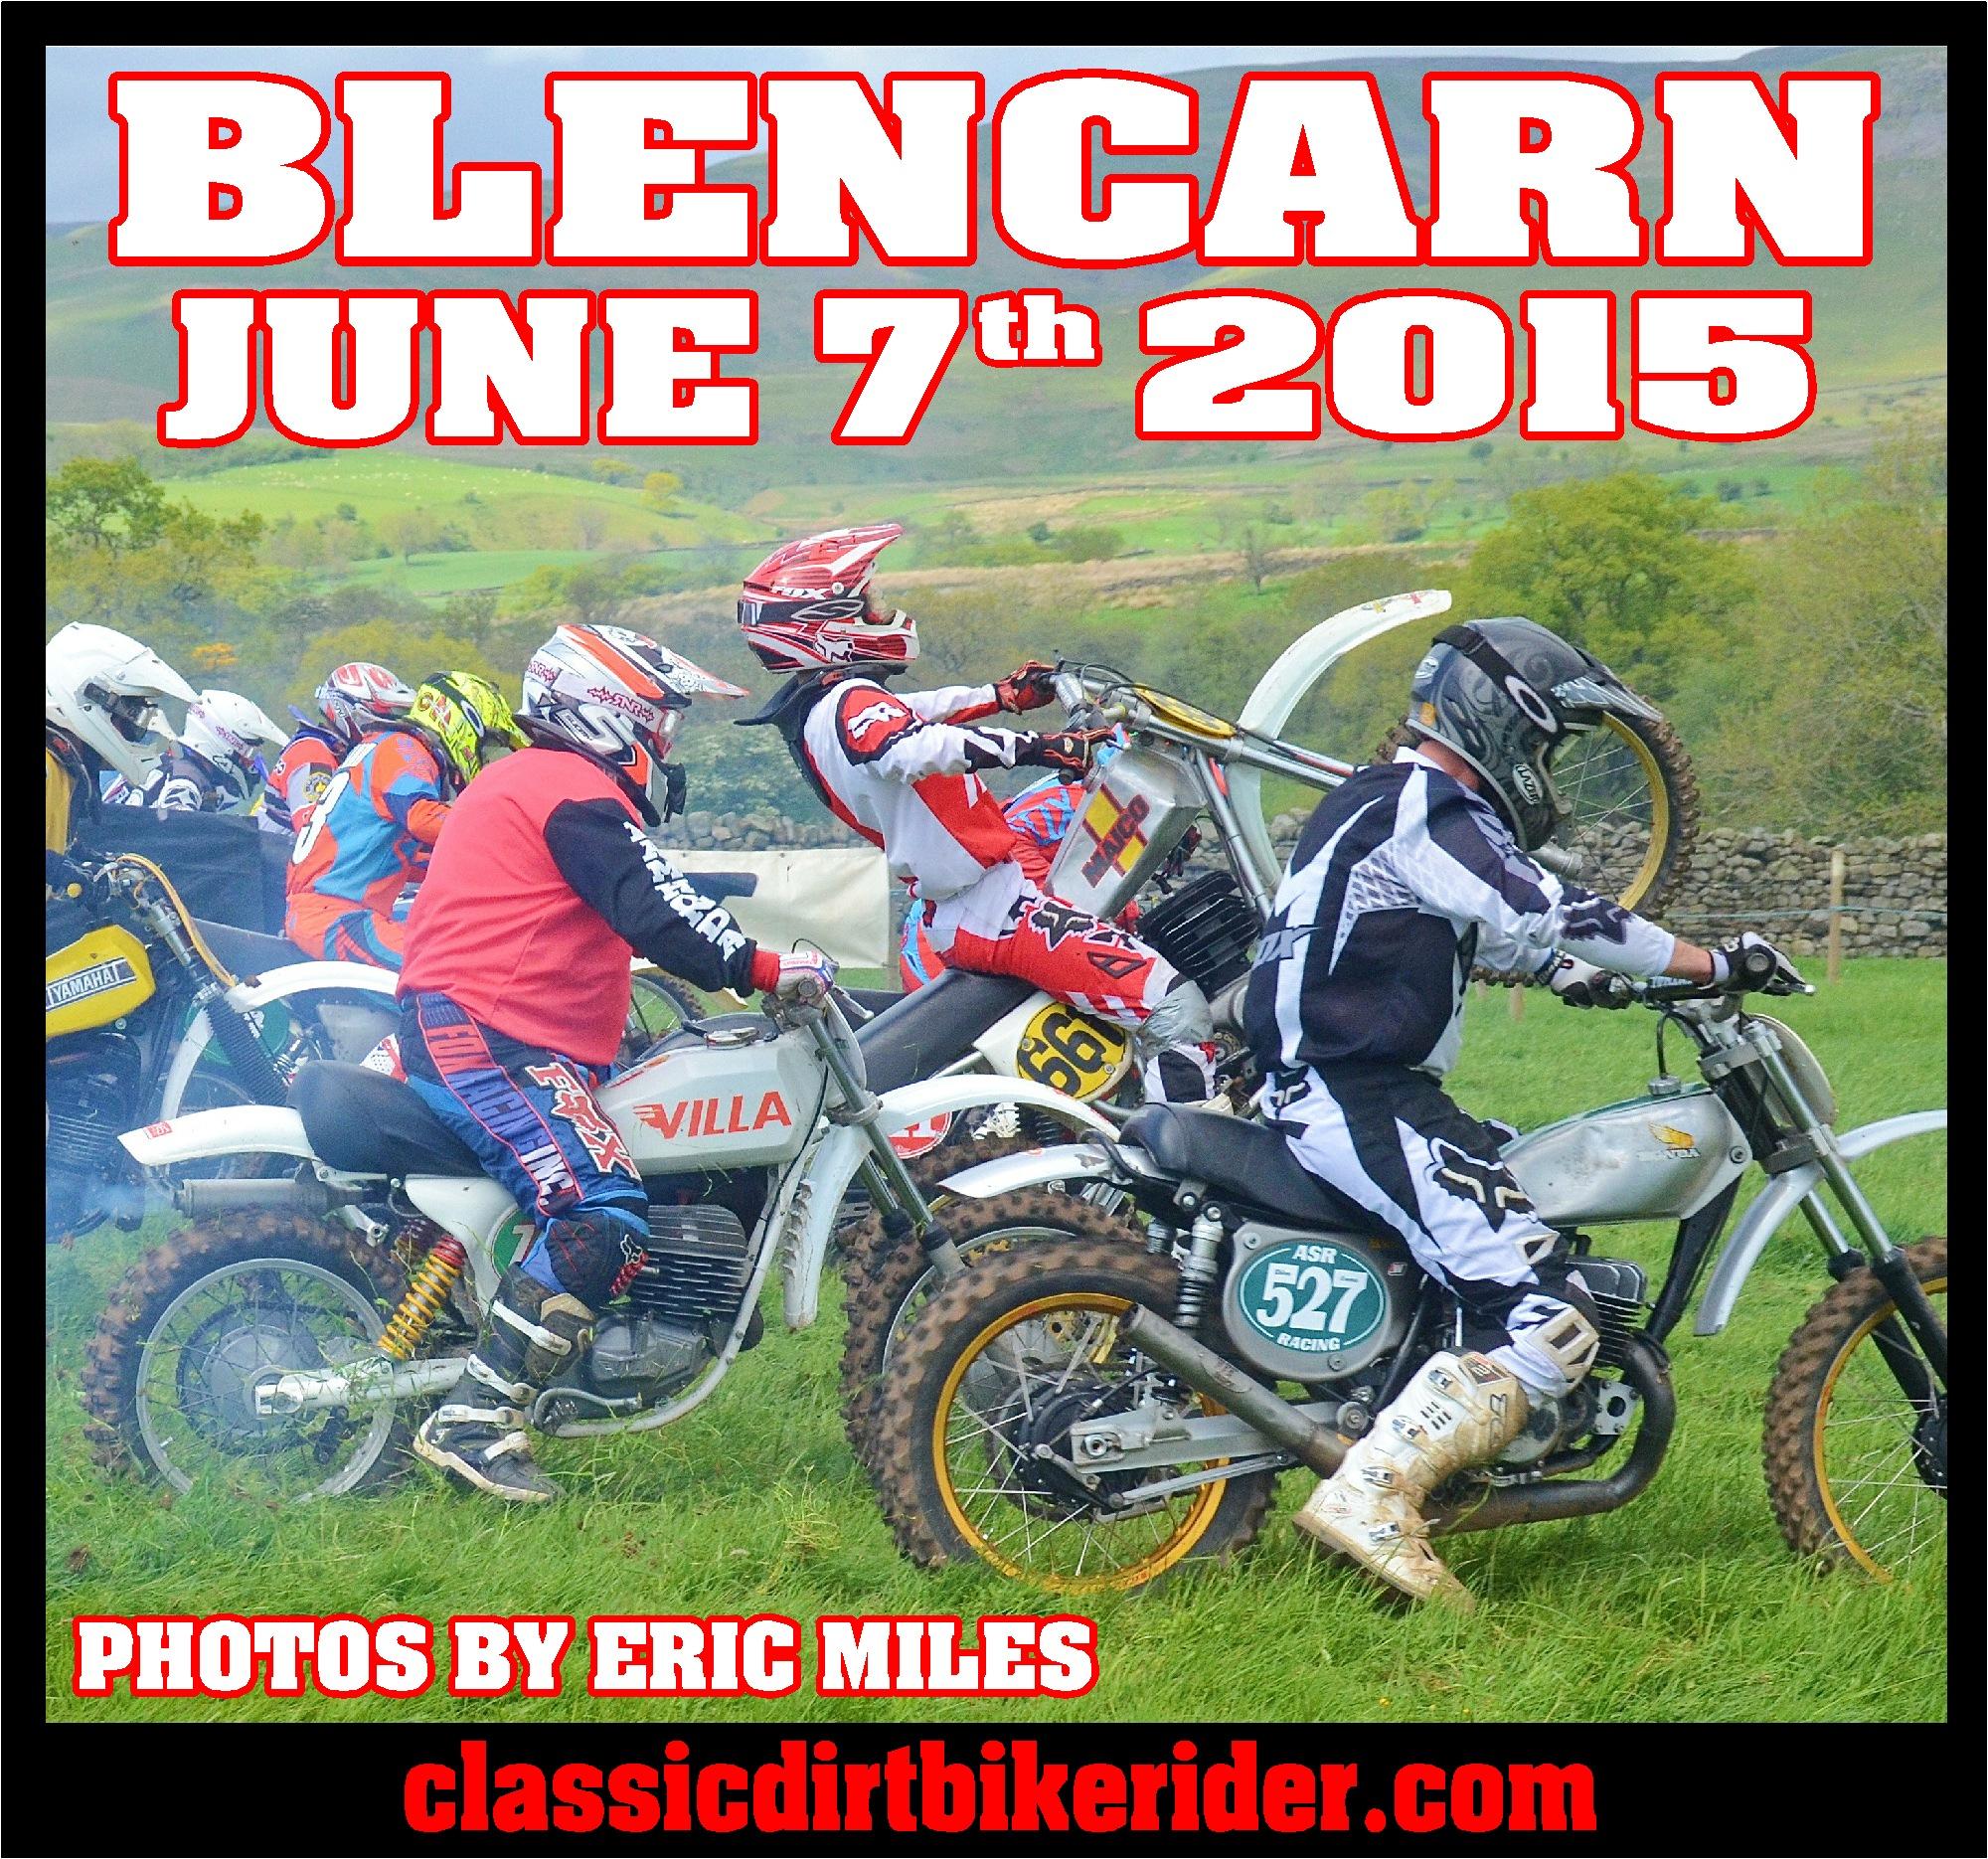 Classic scramble championship round 2 Blencarn Cumbria june 7th 2015 classicdirtbikerider.com